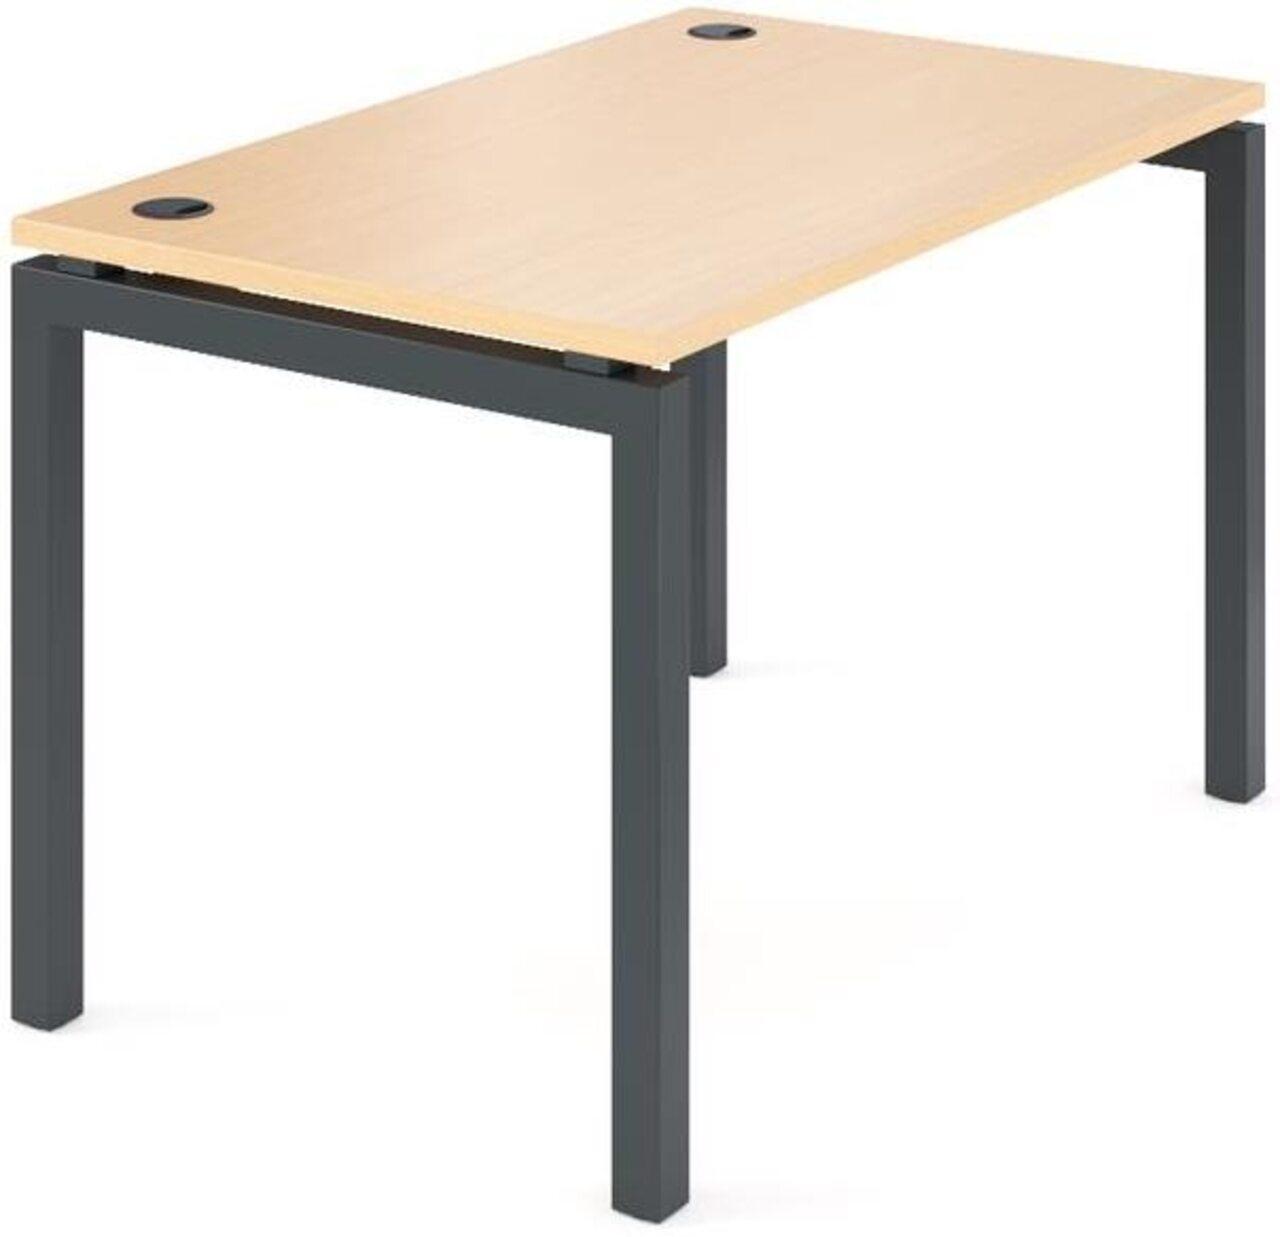 Стол на металлокаркасе  Арго 120x73x76 - фото 7